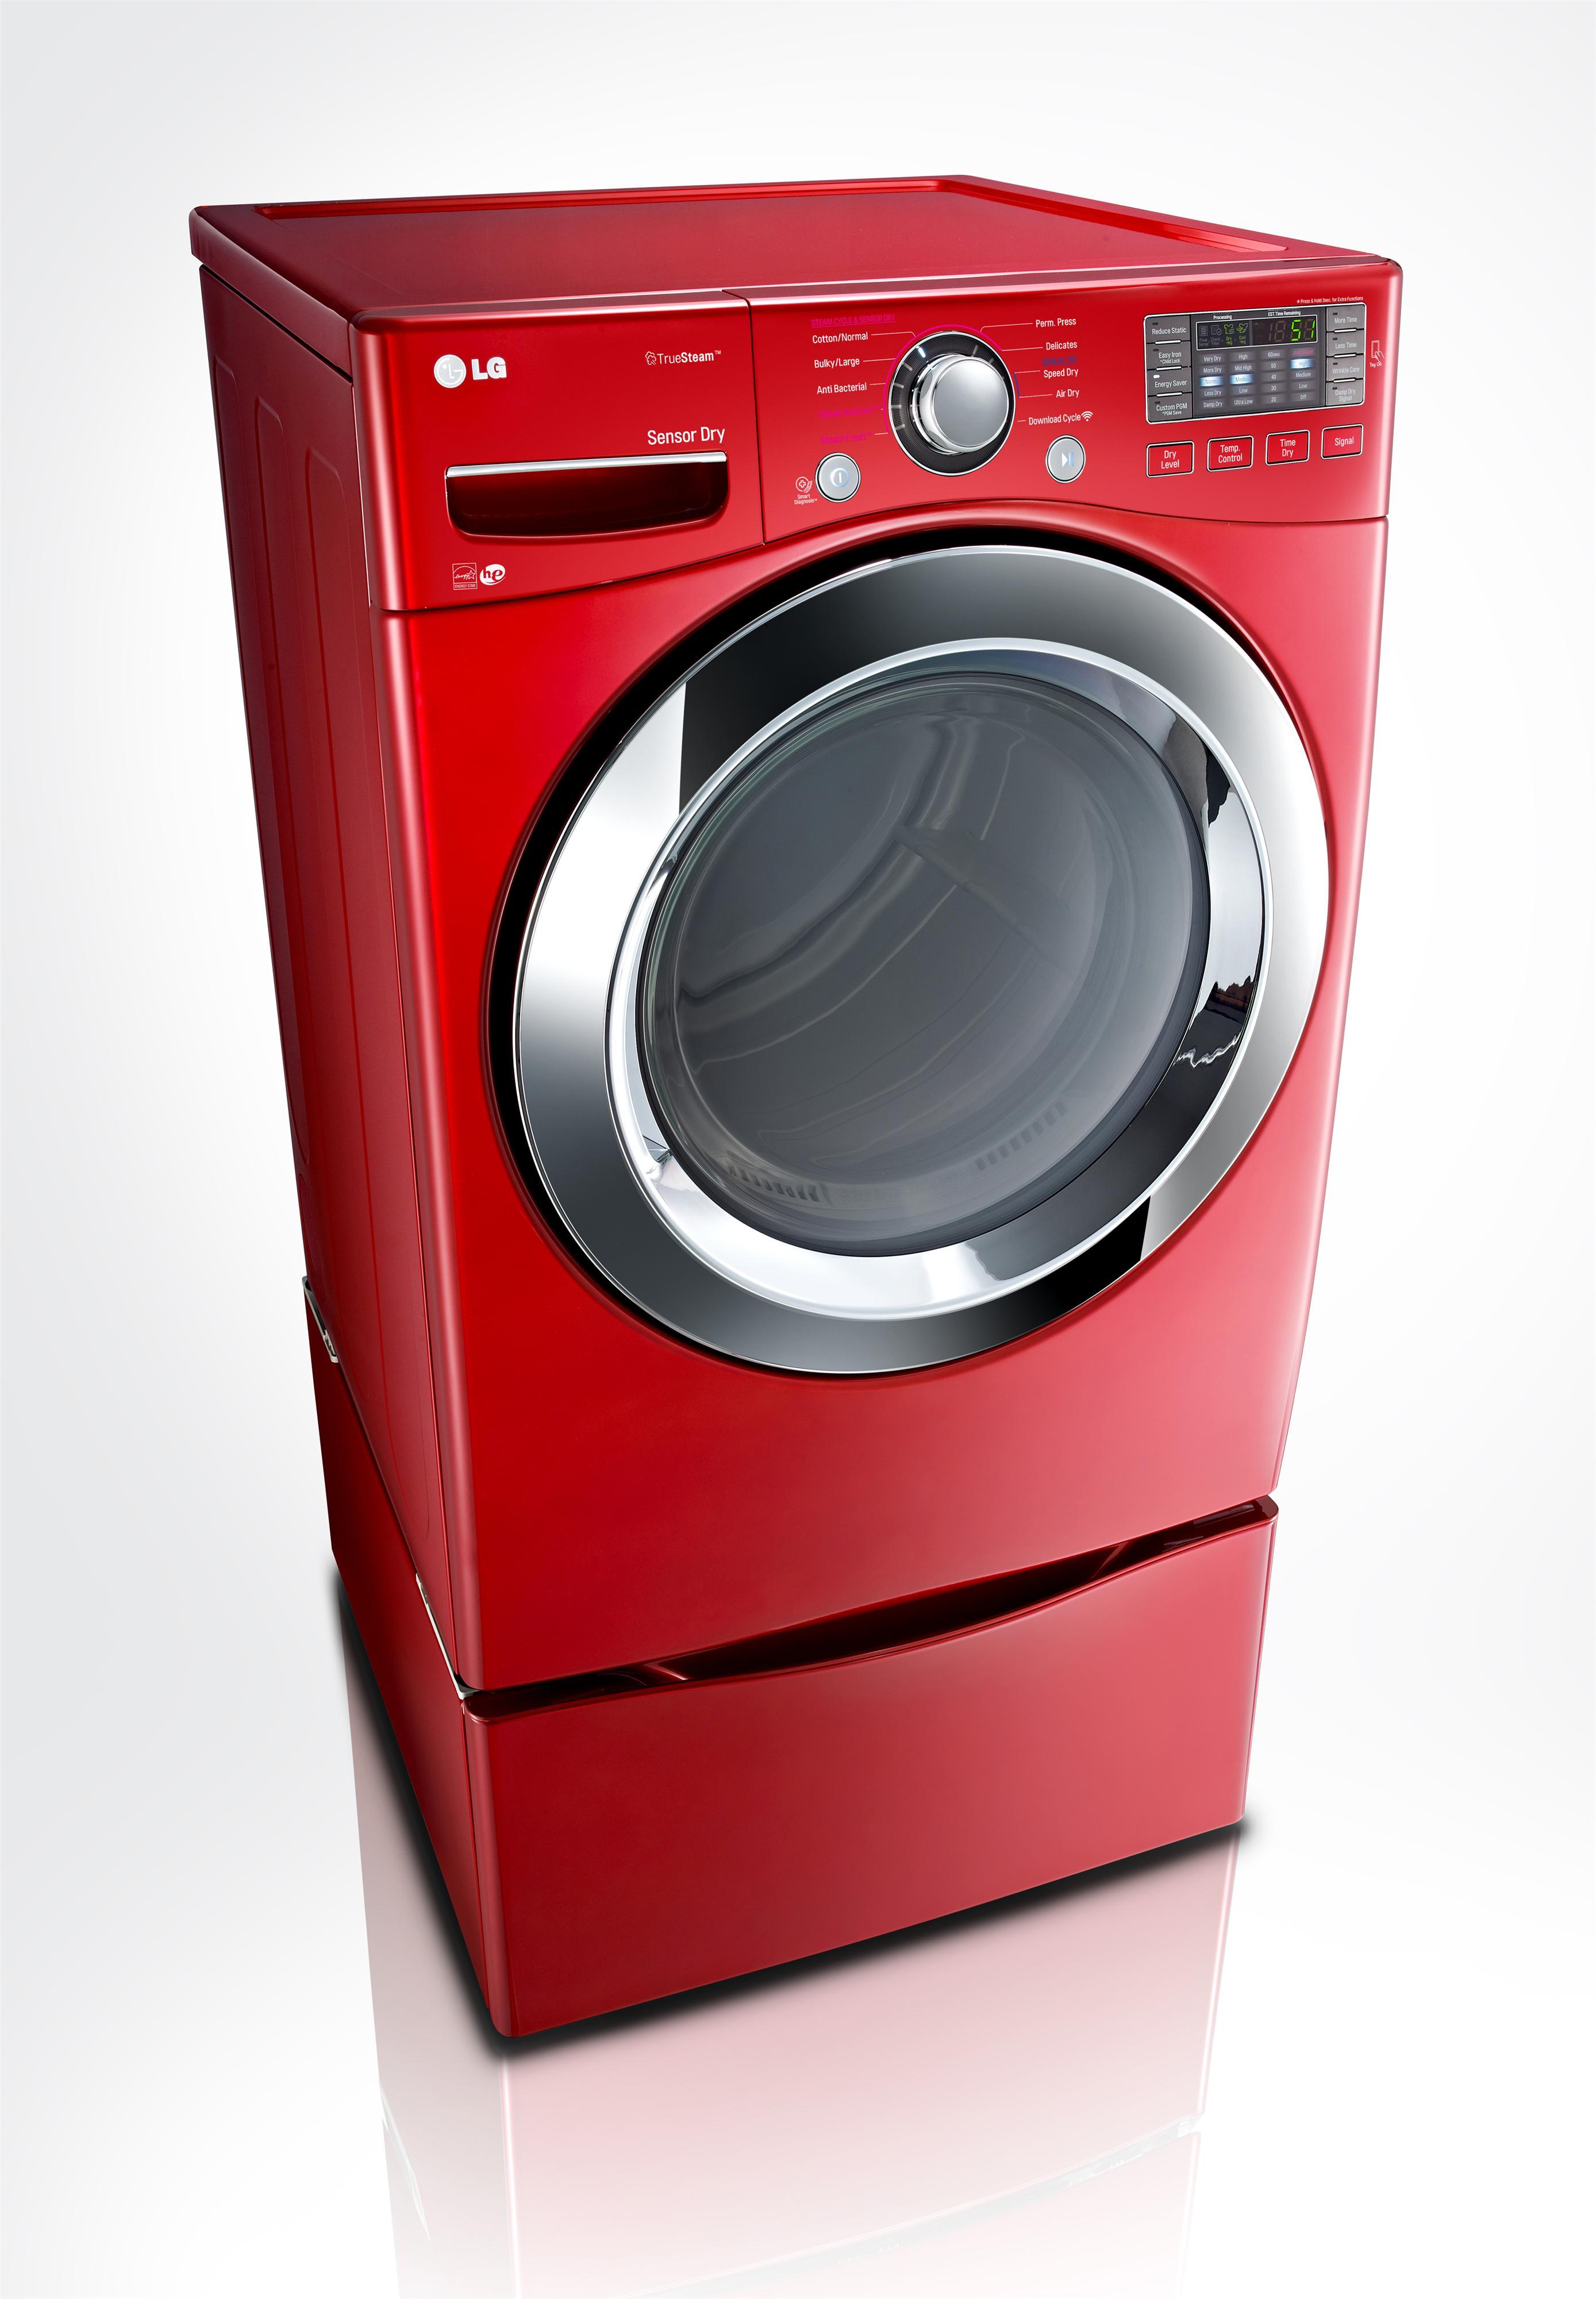 LG Appliances Dryers 7.4 cu. ft. Front Load Electric Dryer - Item Number: DLEX3370R